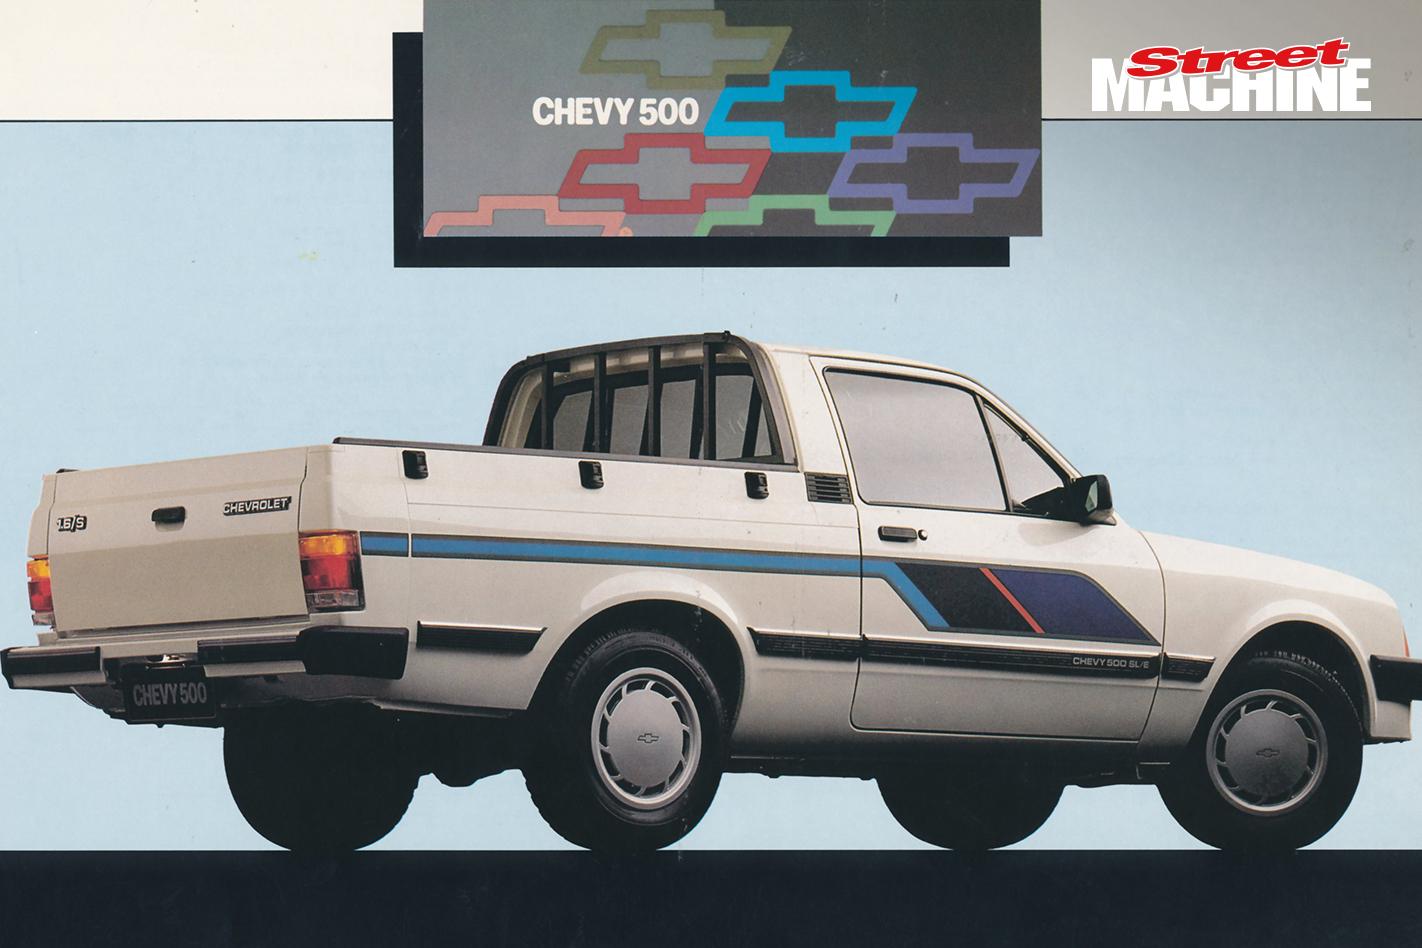 Chevrolet Chevette Gemini